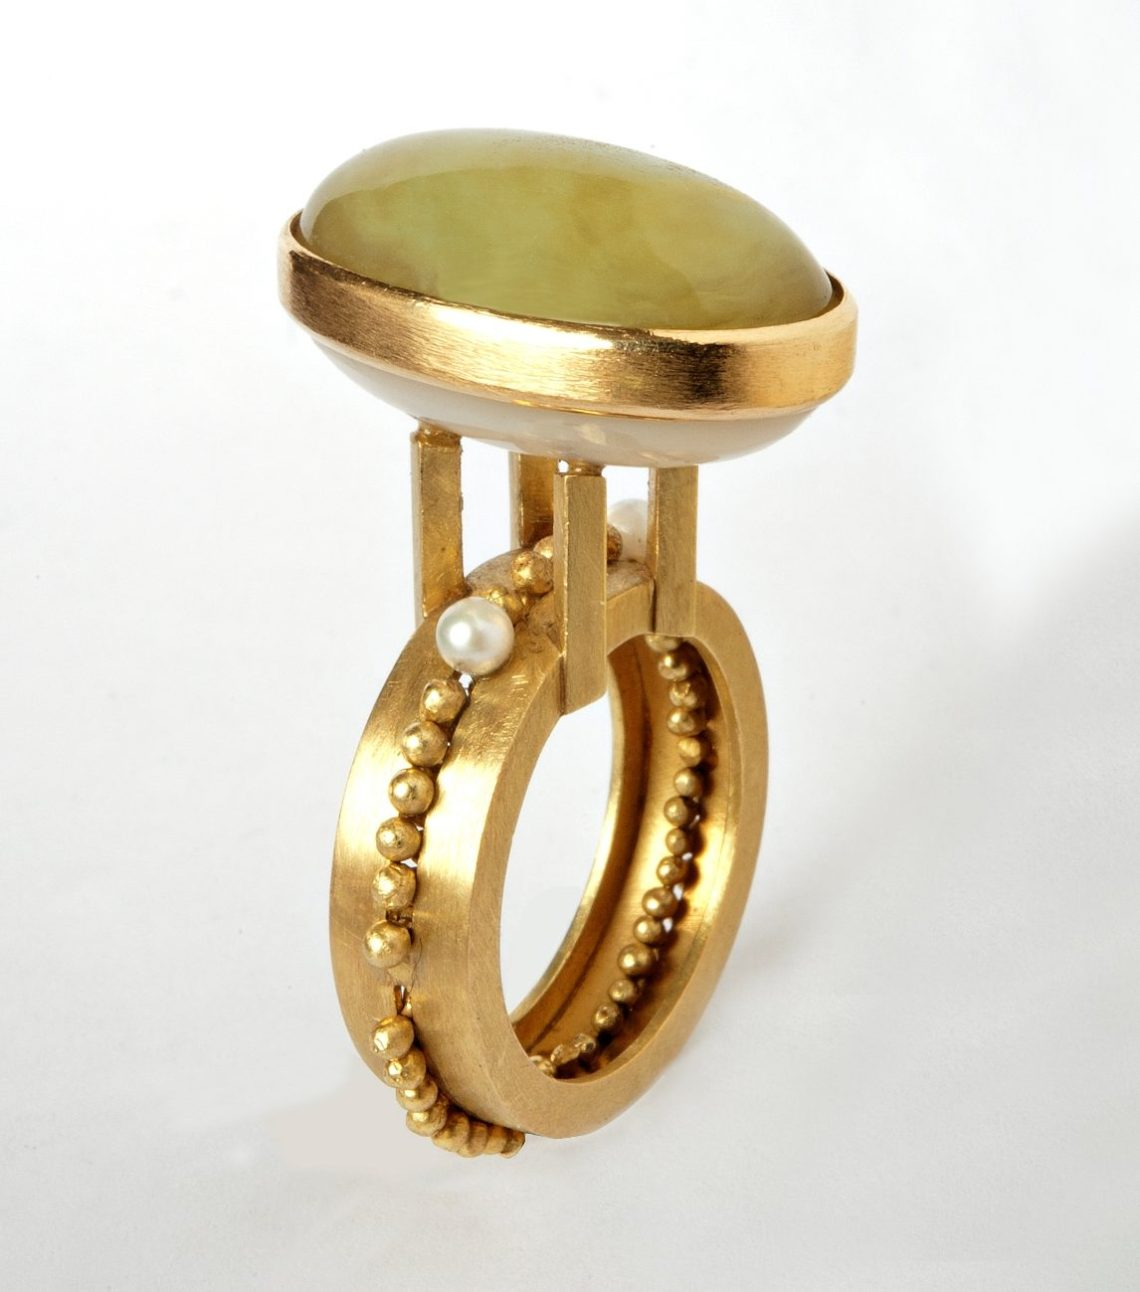 Francesca di Ciaula, Io Sto, ring, 2007. Foto met dank aan Francesca di Ciaula©